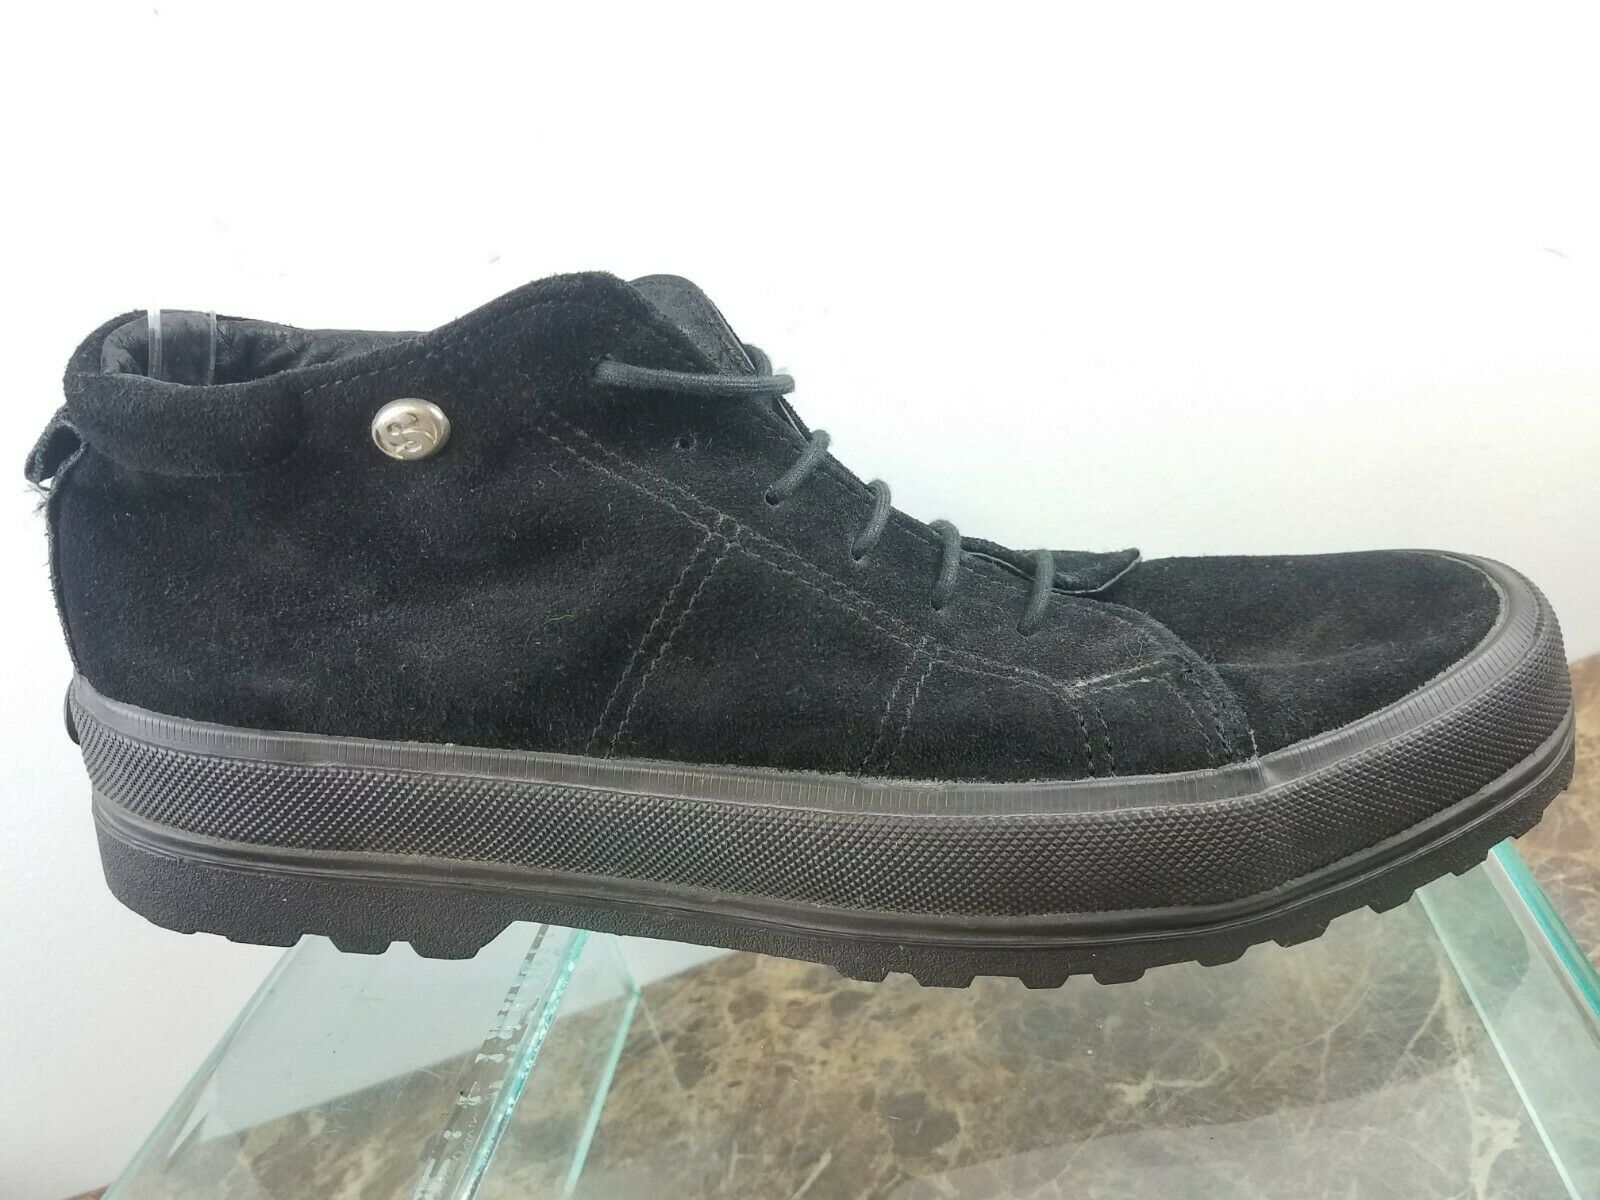 Superga Black Suede Leather Platform Fashion Lace Up Casual shoes Womens Sz 10.5